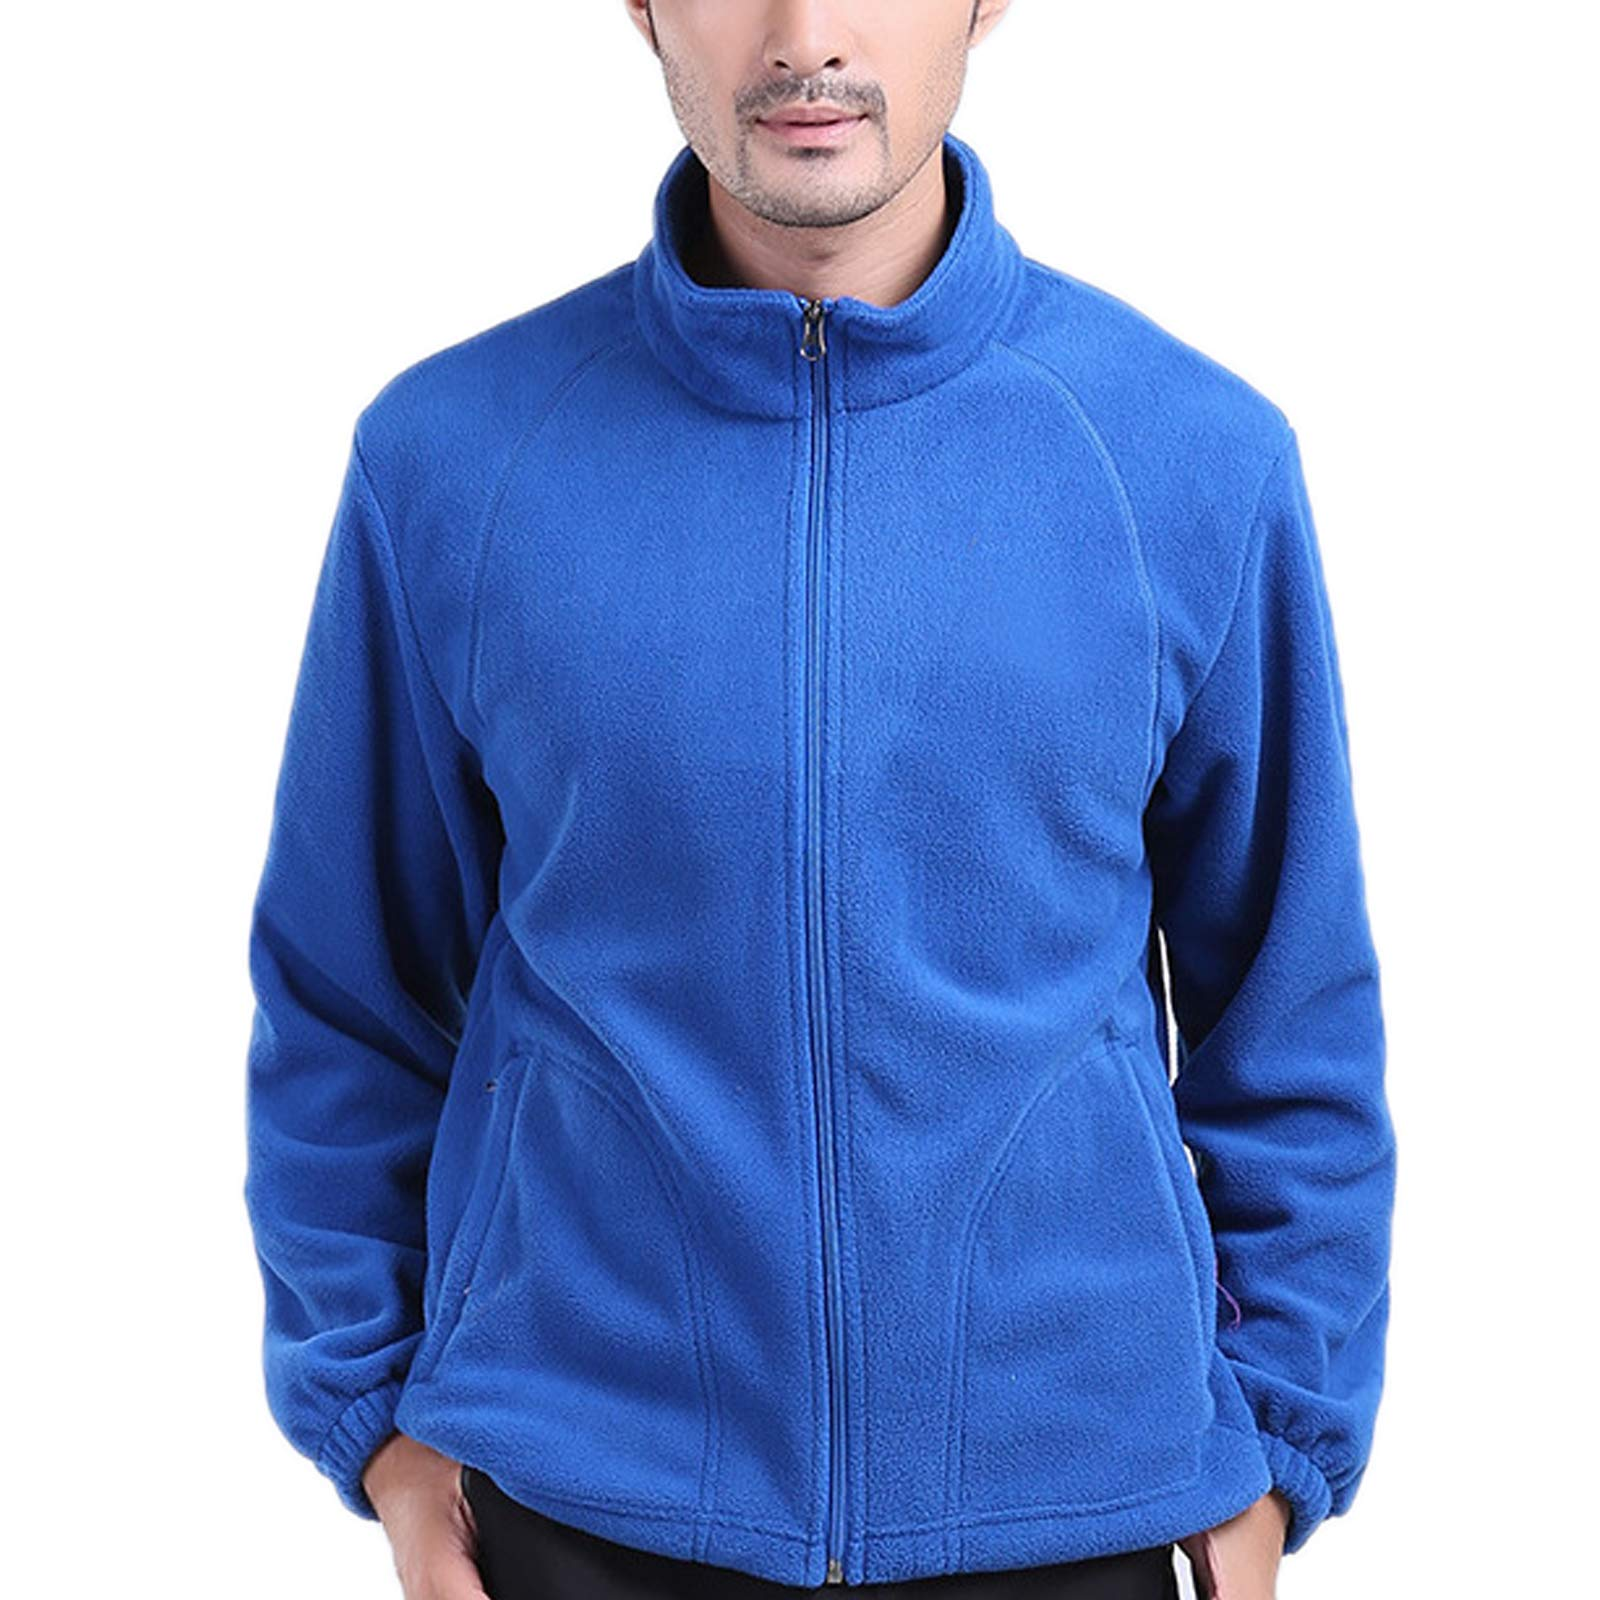 Elonglin Mens Fleece Jacket Full Zip Stand Collar Sportwear Top Outwear Blue Bust 50.7''(Asie 3XL) by Elonglin